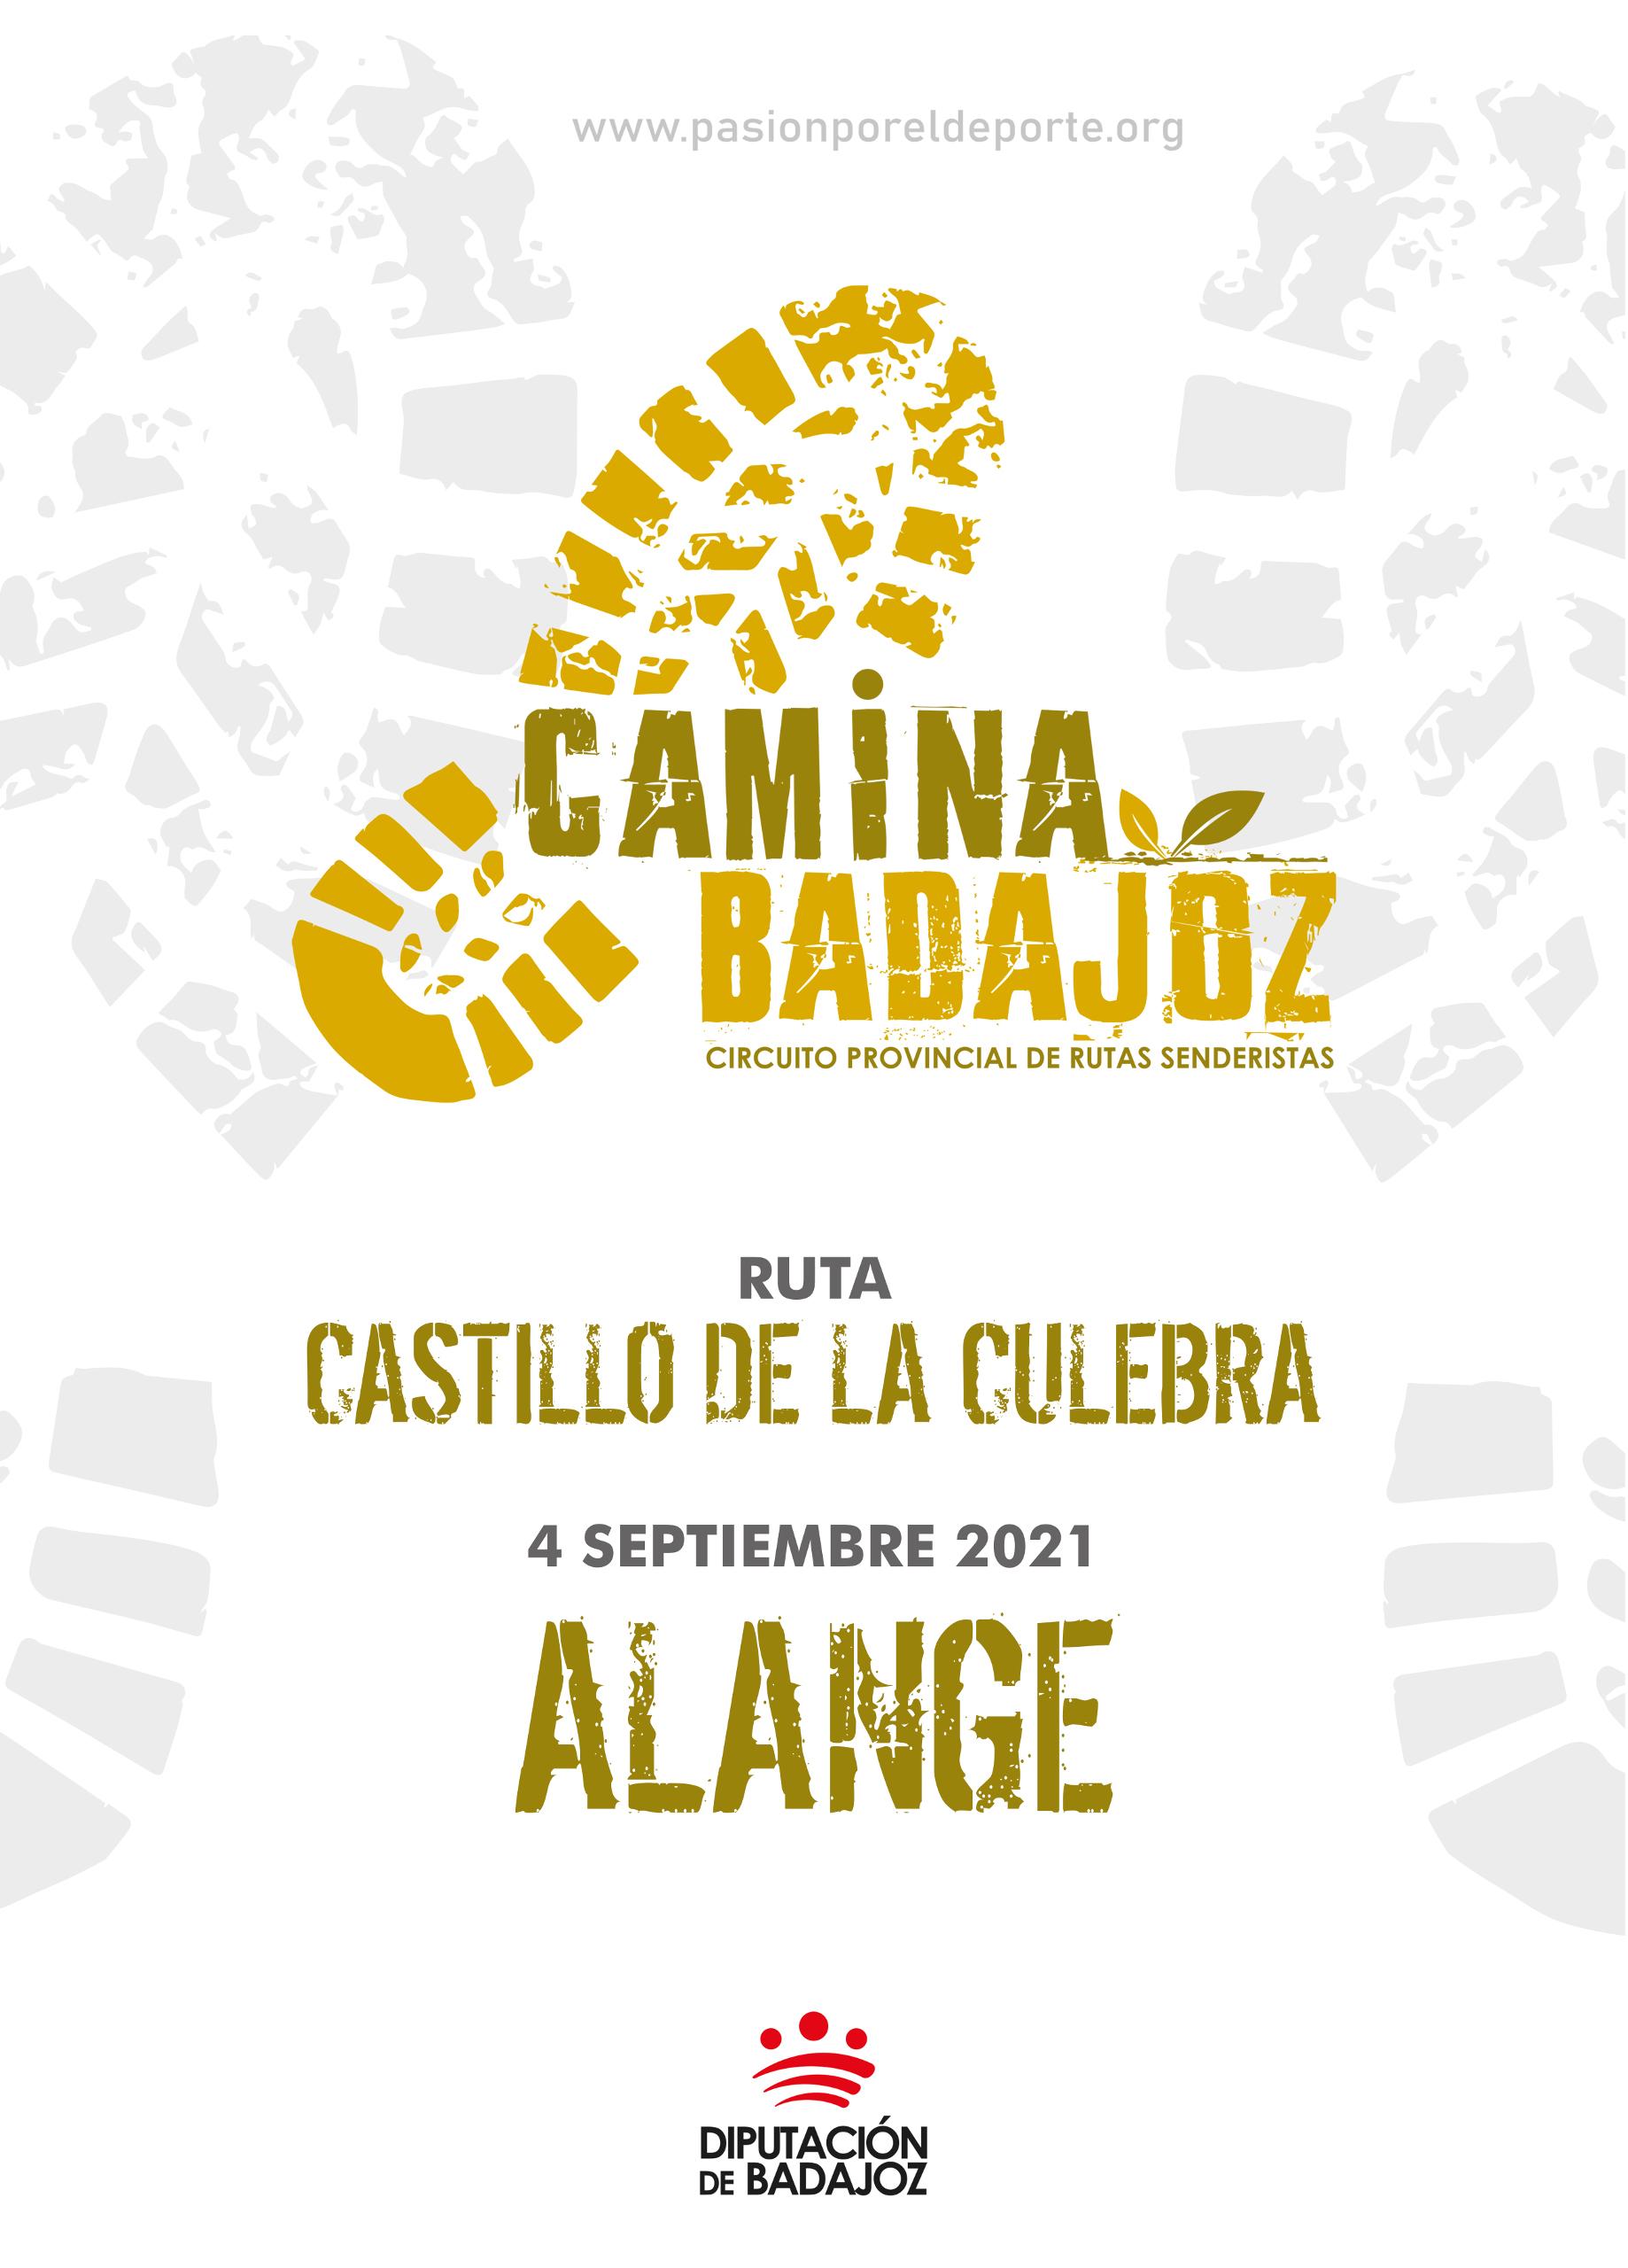 Imagen del Evento Ruta del Castillo de la Culebra